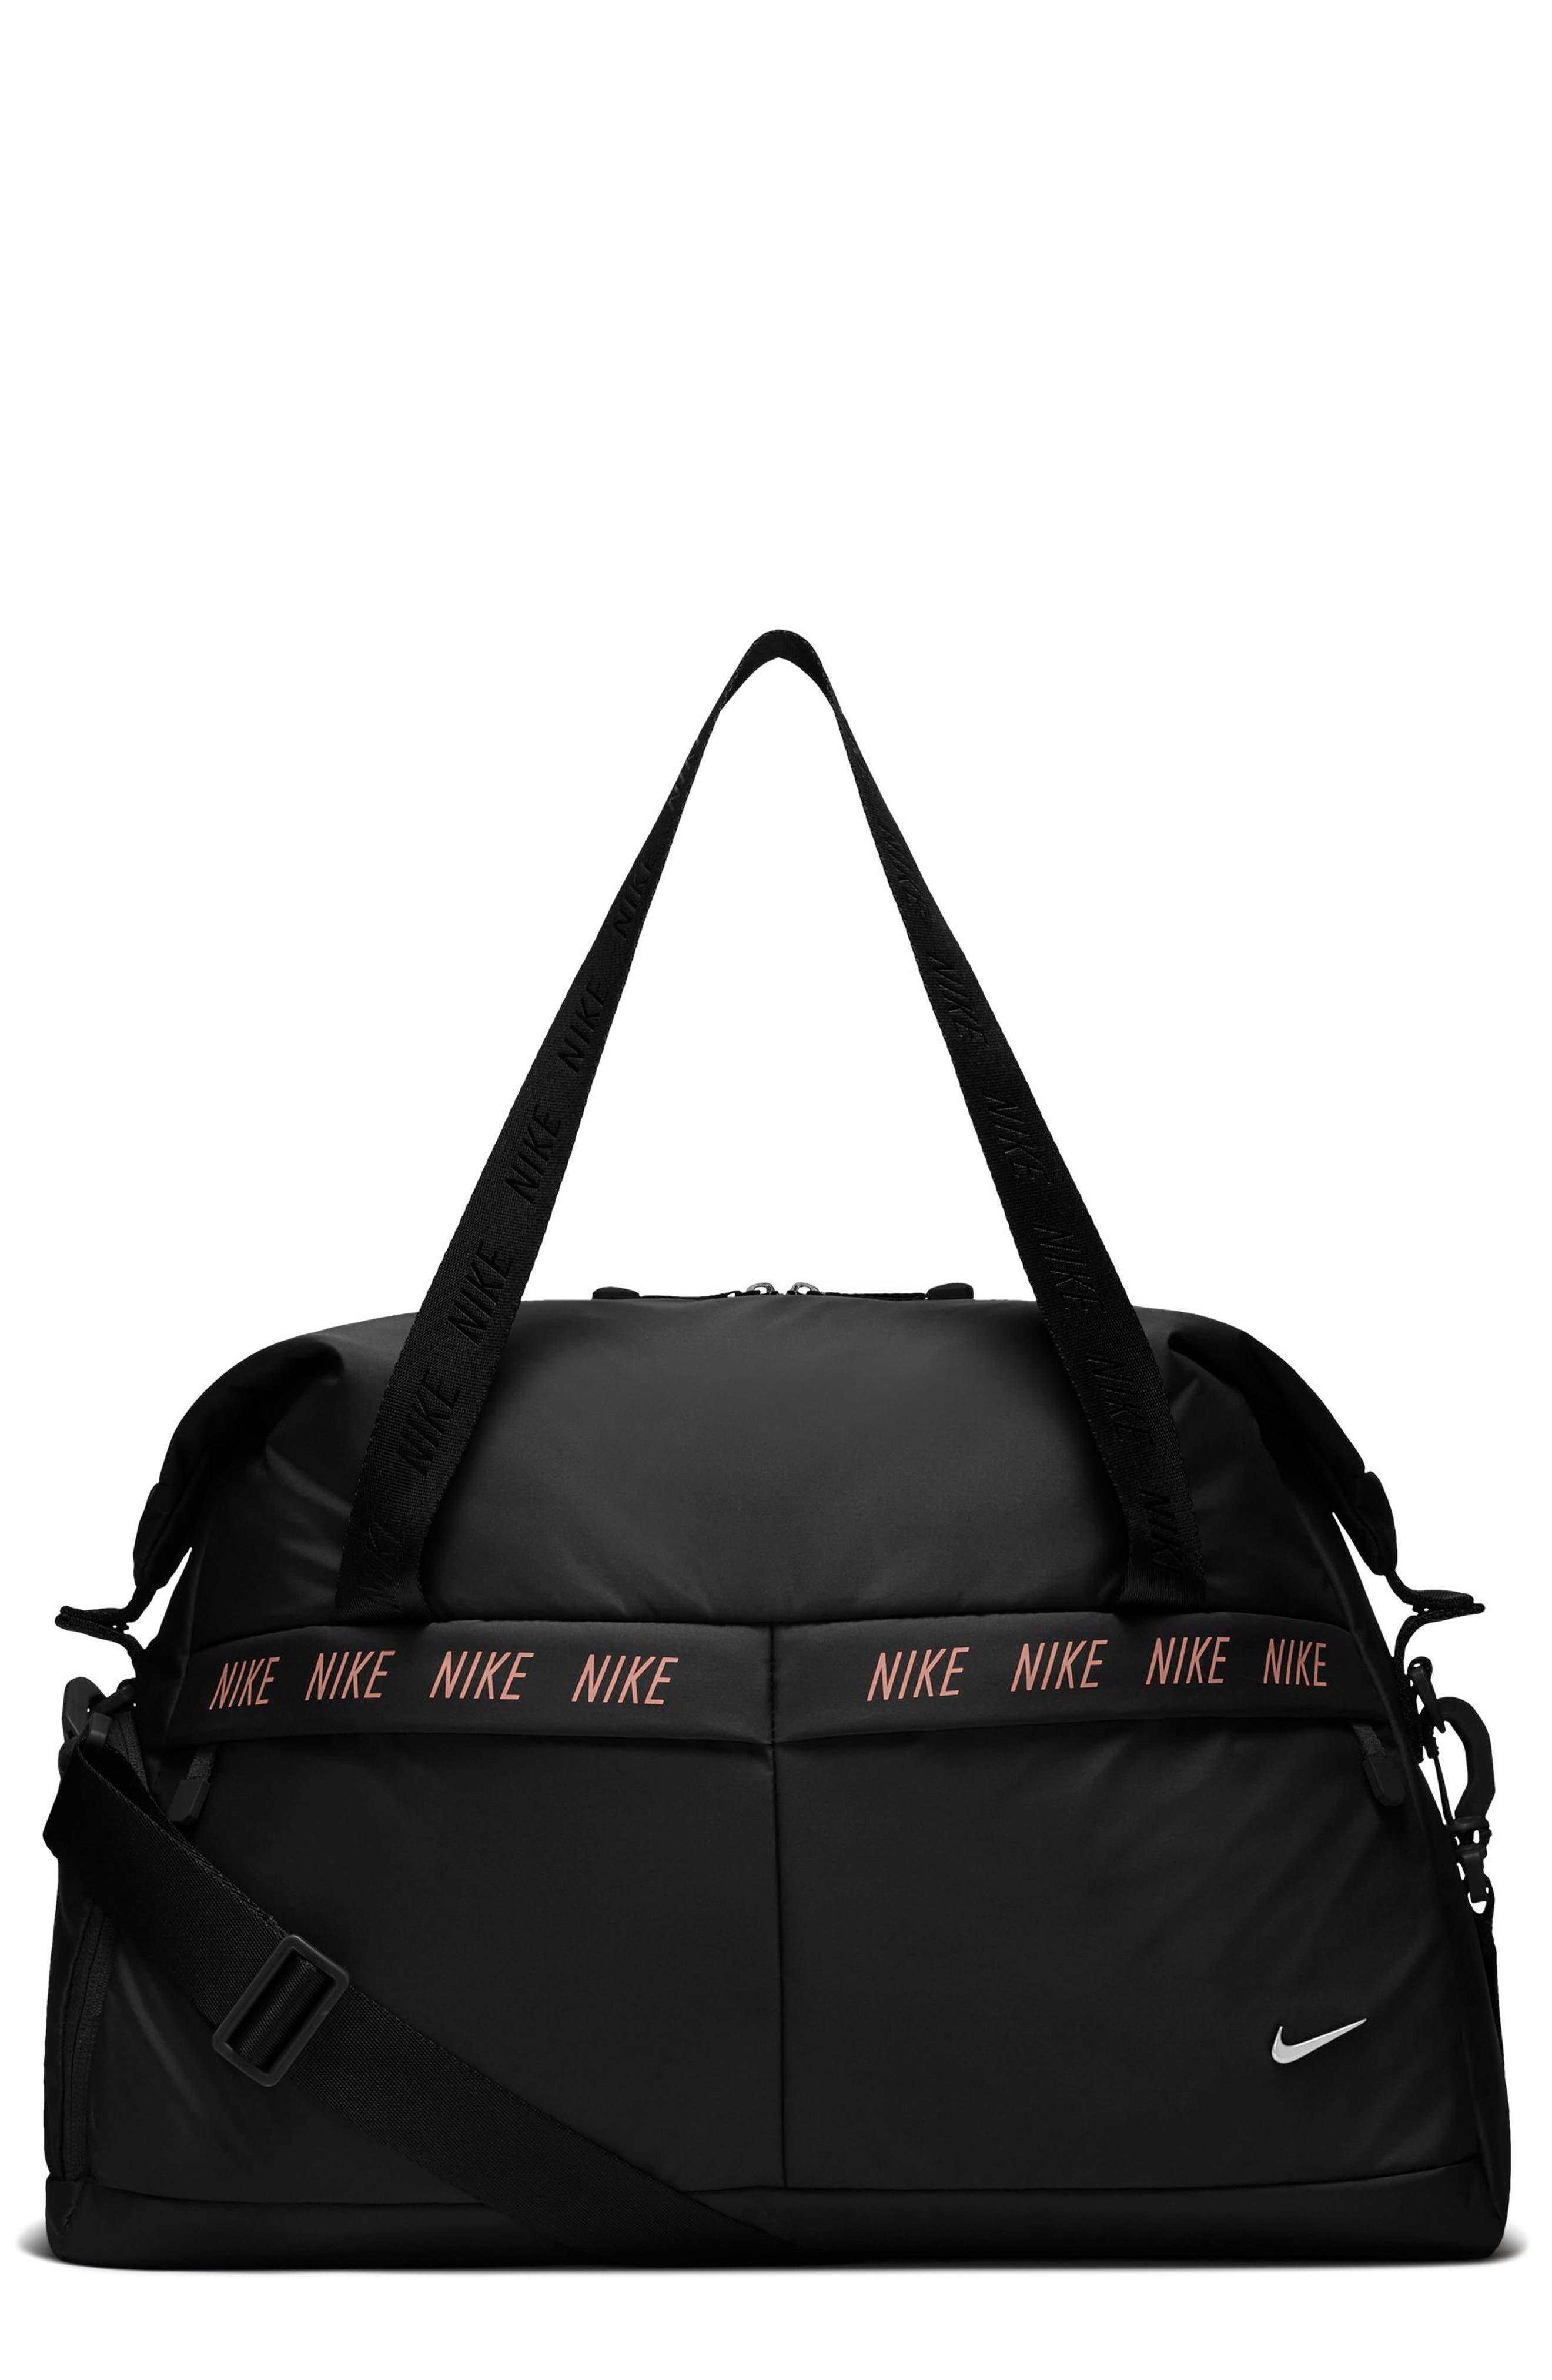 Legend Club Training Duffel Bag,                             Main thumbnail 1, color,                             BLACK/ STORM PINK/ BLACK